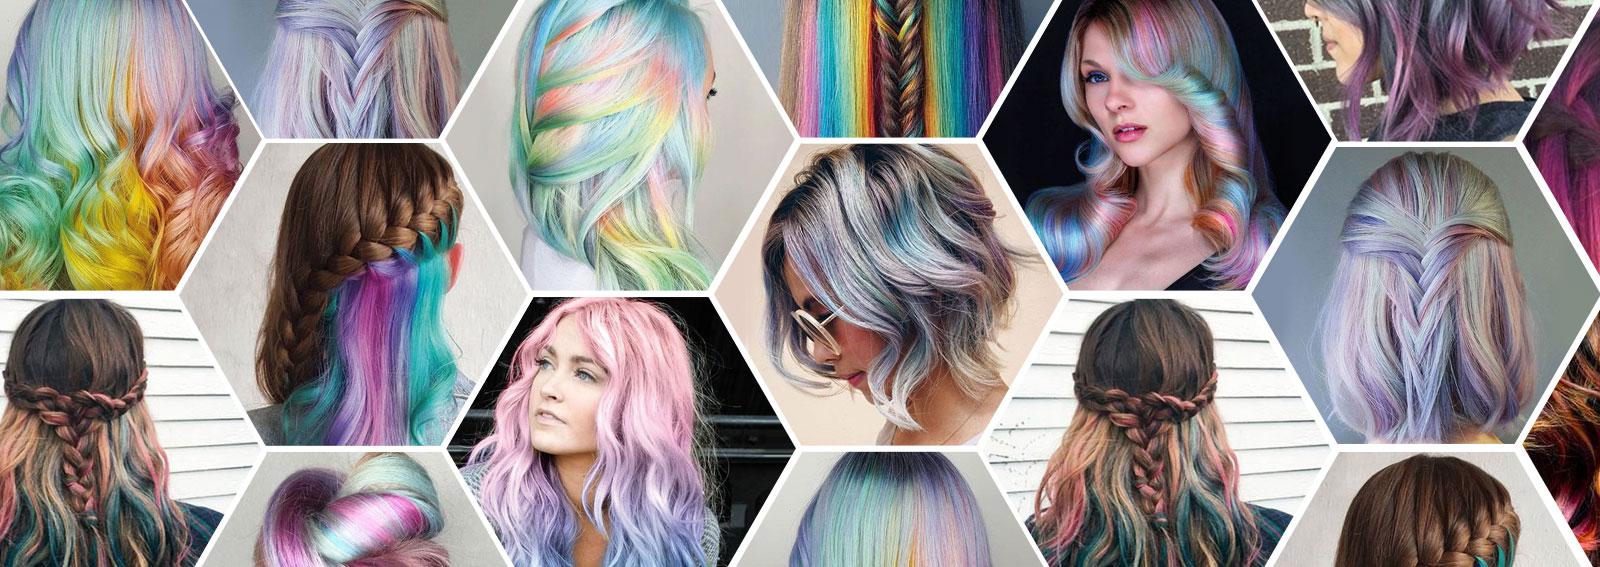 capelli arcobaleno DESKTOP_arcobaleno